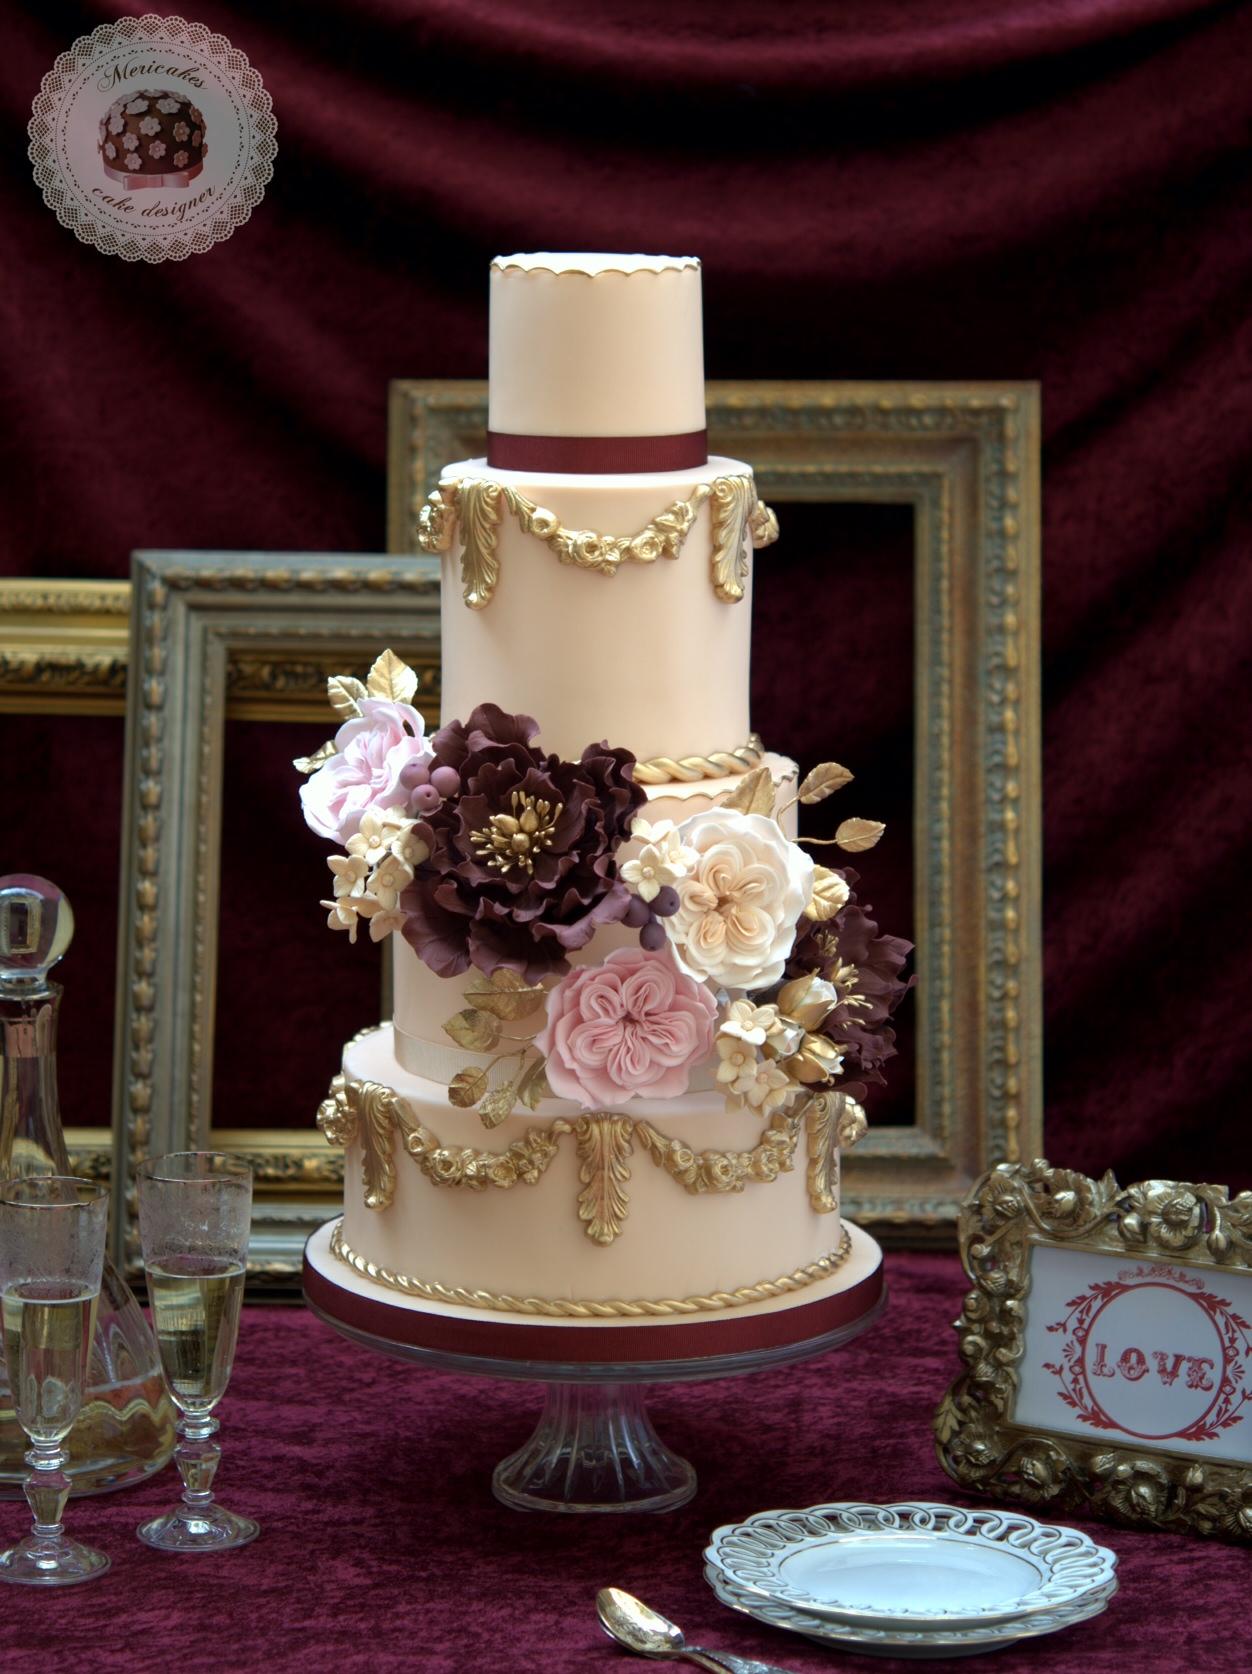 baroque-love-wedding-cake-mericakes-4